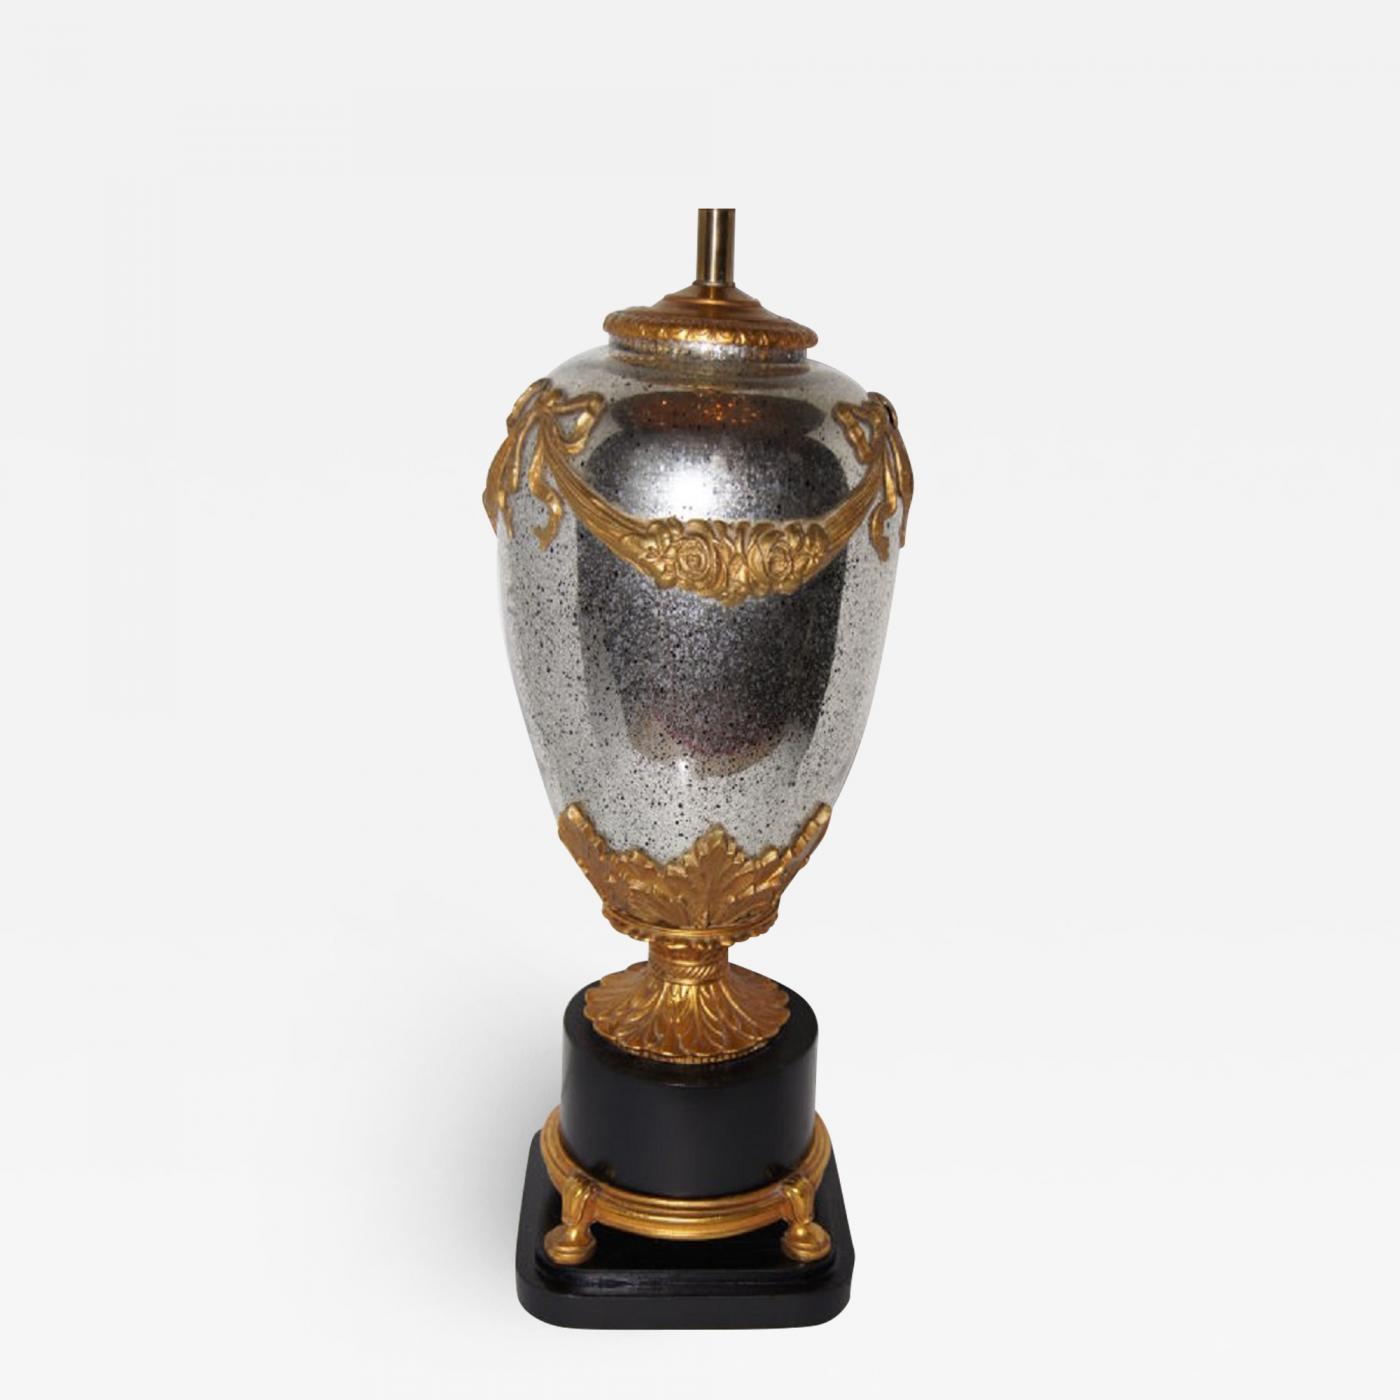 Image of: Large Mercury Glass Table Lamp